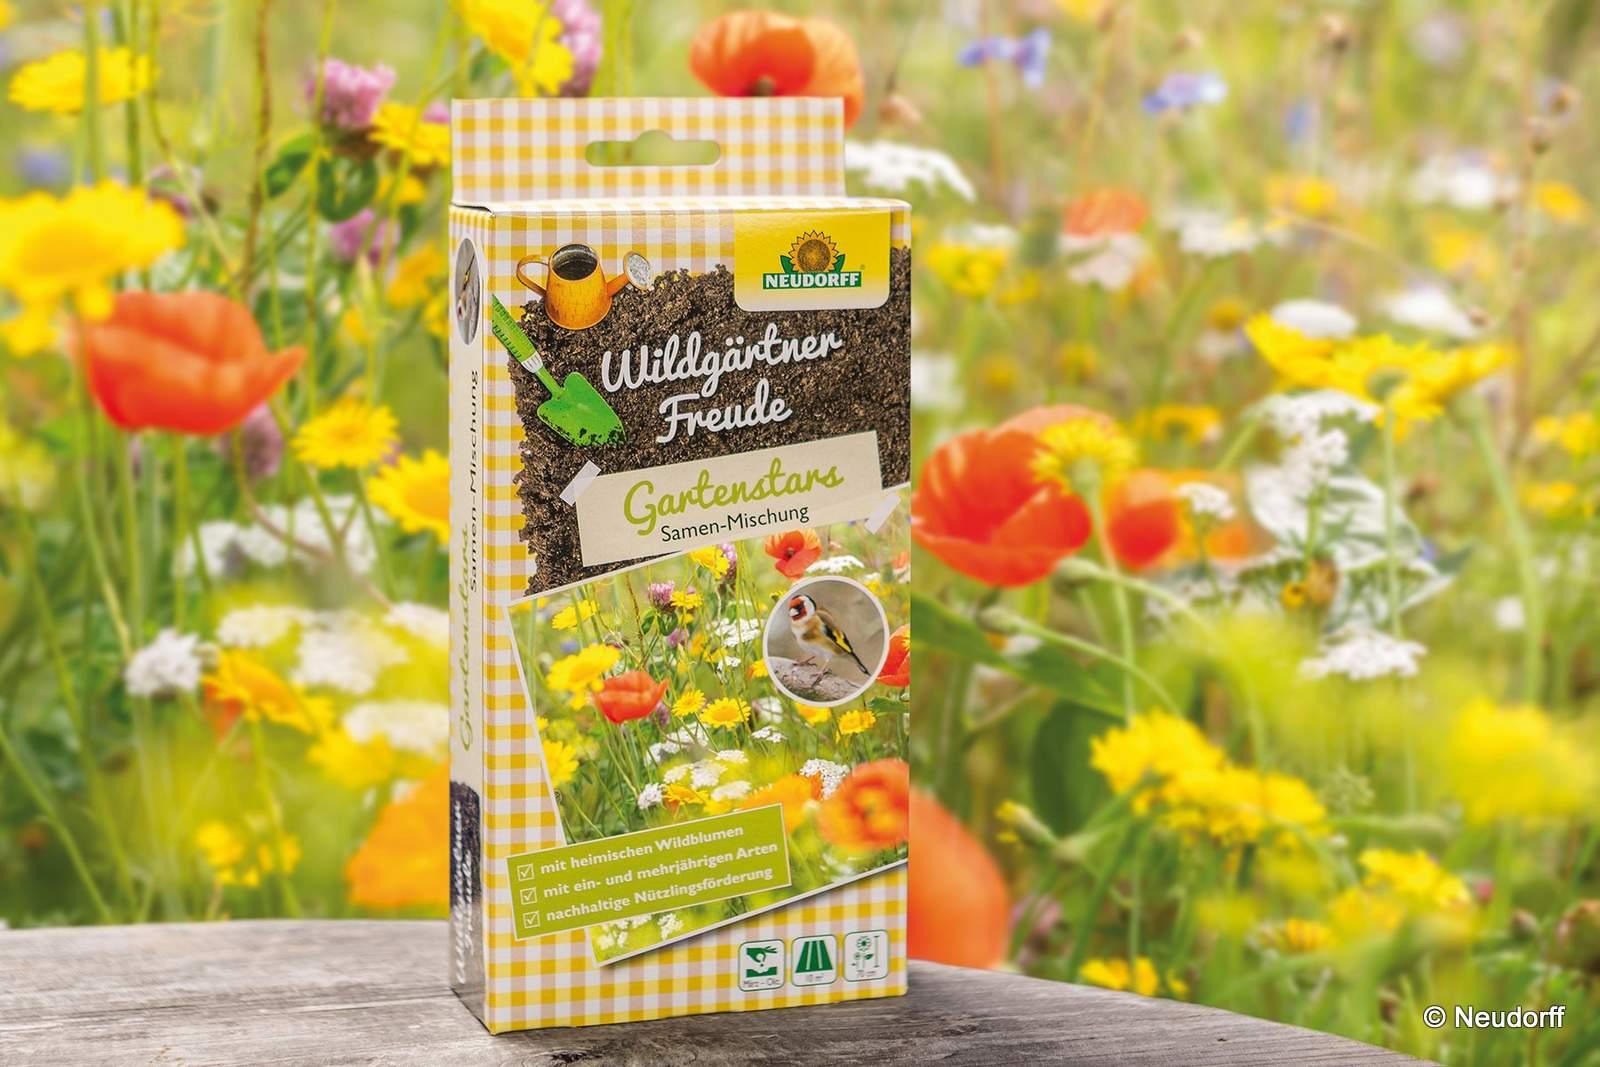 Neudorff Samenmischung Wildgärtnerfreude Gartenstars